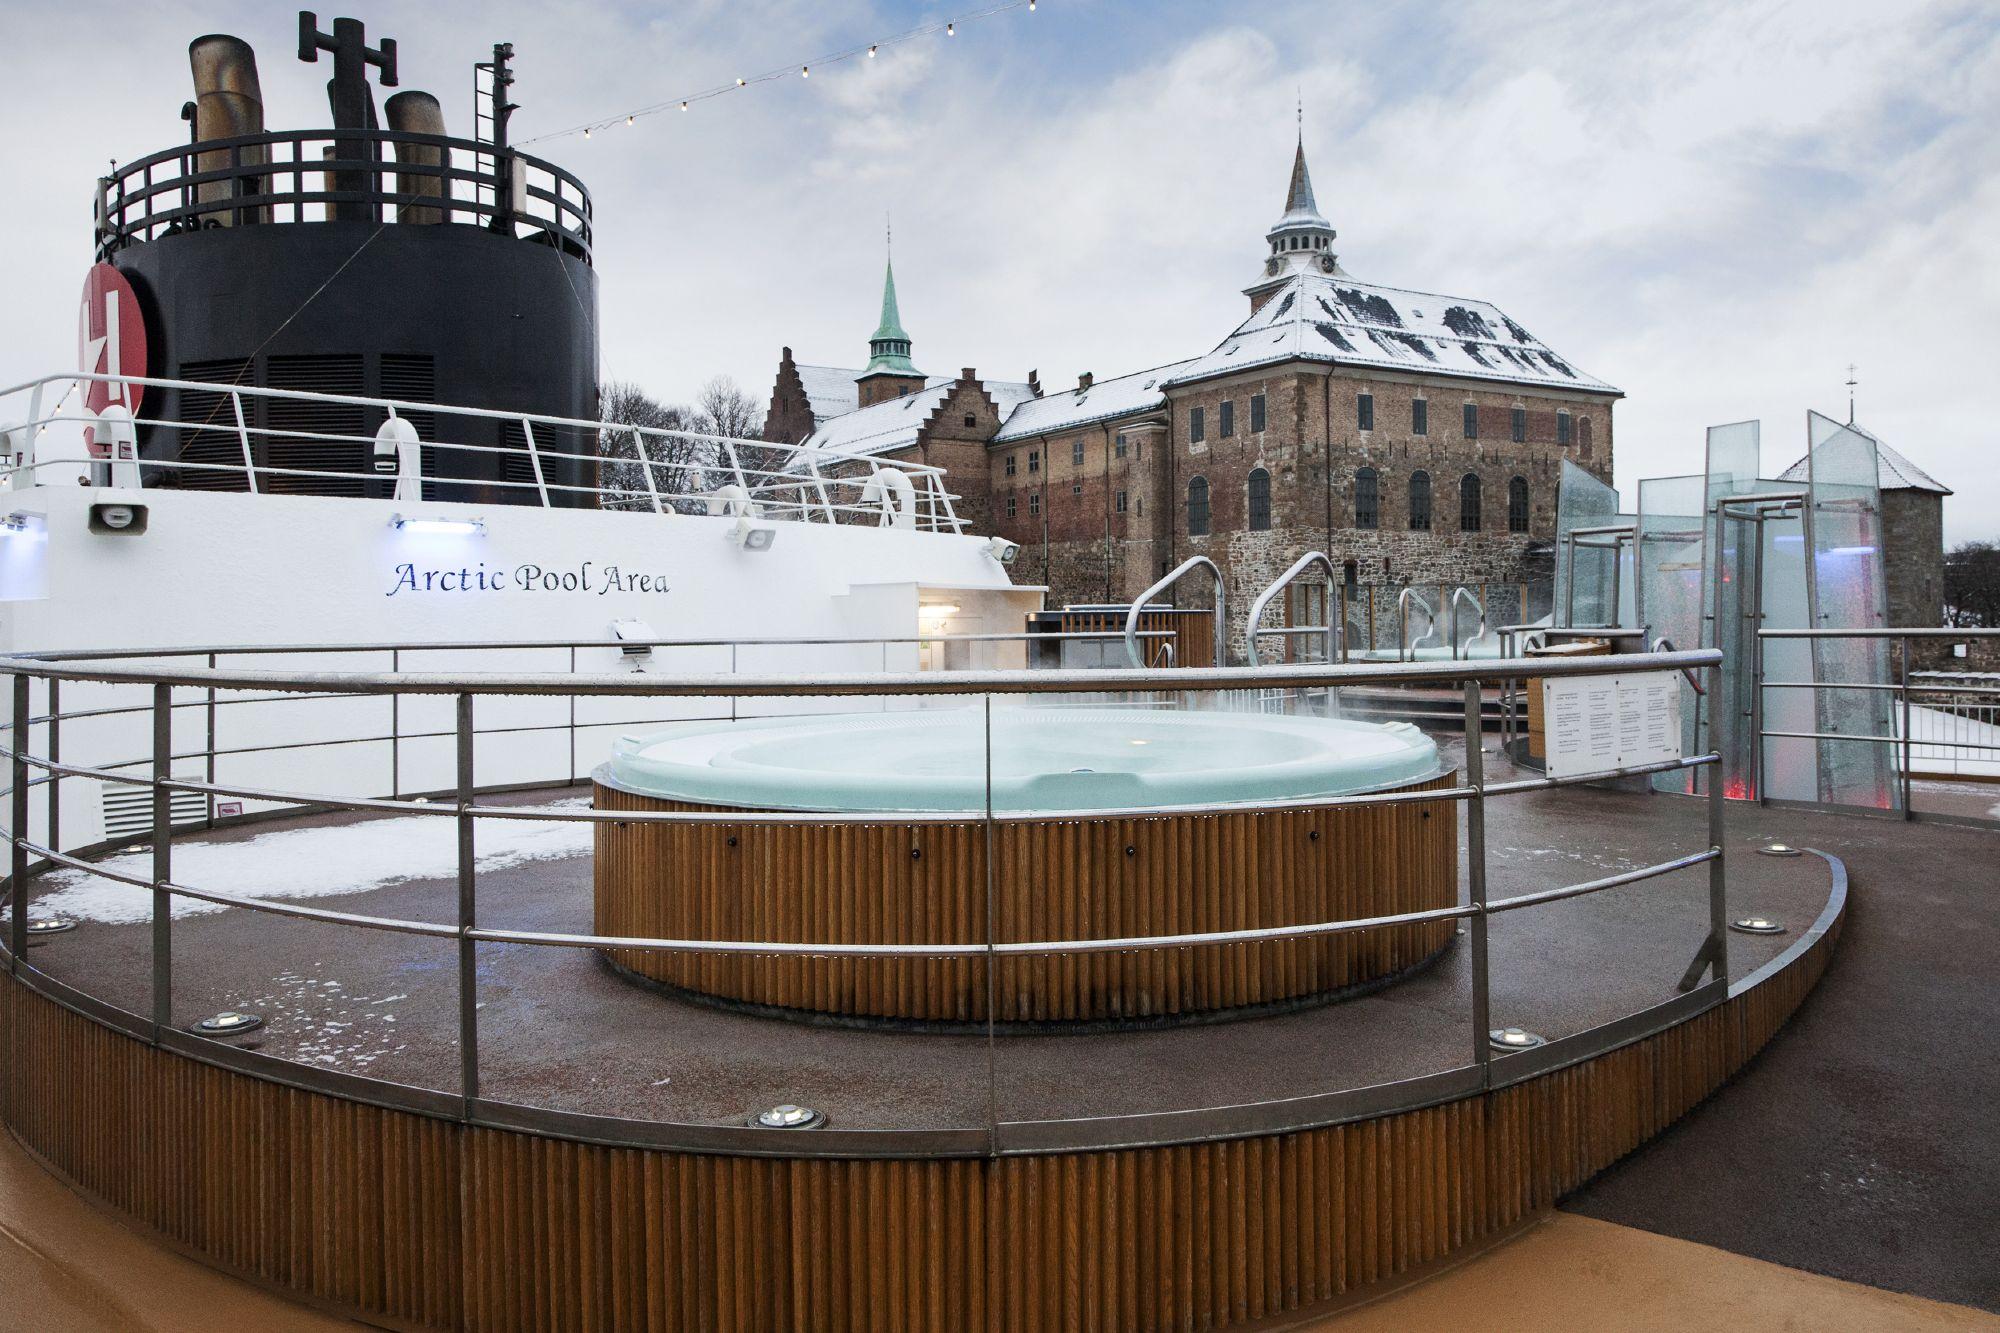 Hurtigruten Cruise Lines MS Trollfjord Exterior Hot Tub.jpg